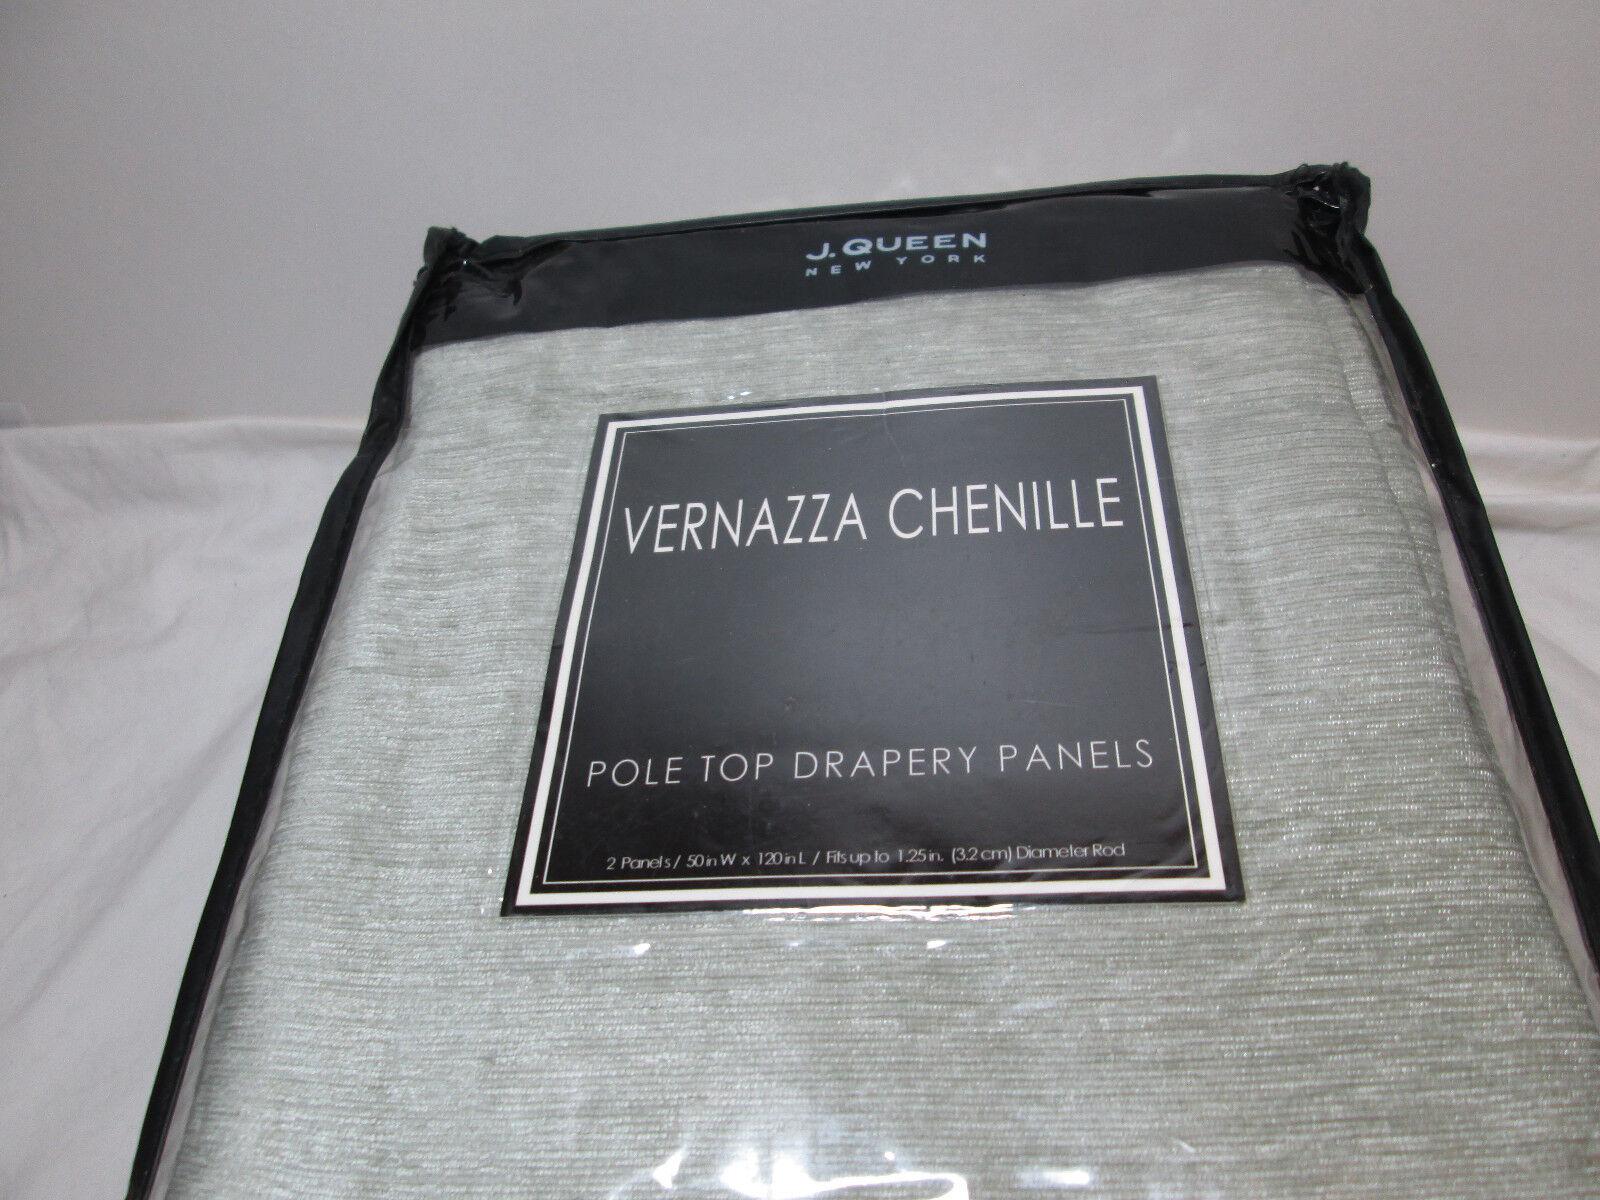 Polo J Queen Vernazza Chenille Nuevo Top Paneles de cortinas Two-50 x120   Aqua Nuevo